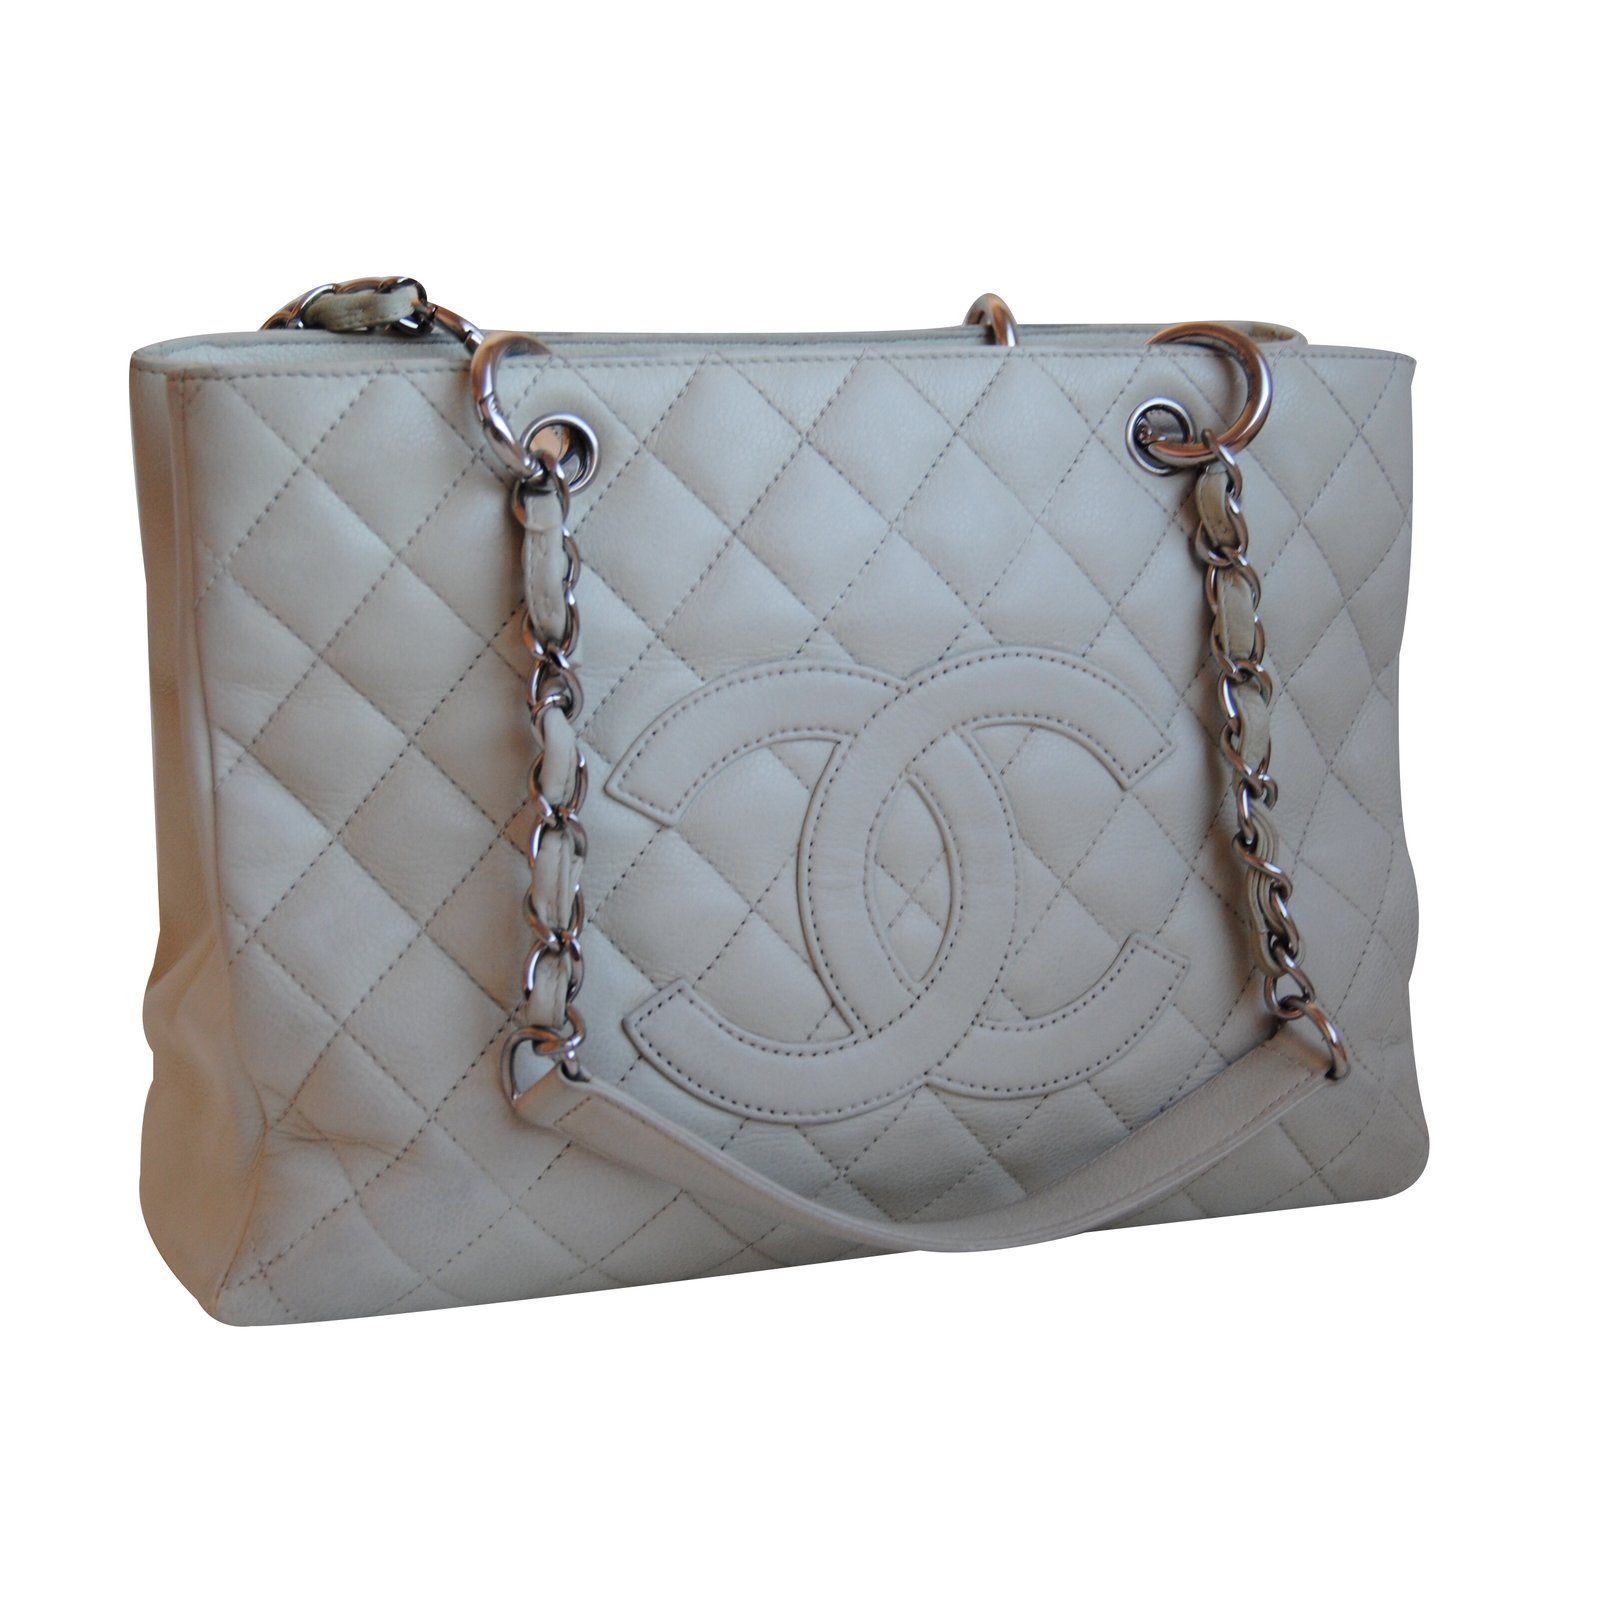 96b411fc0a2e Chanel Grand shopping Handbags Leather White ref.31135 - Joli Closet